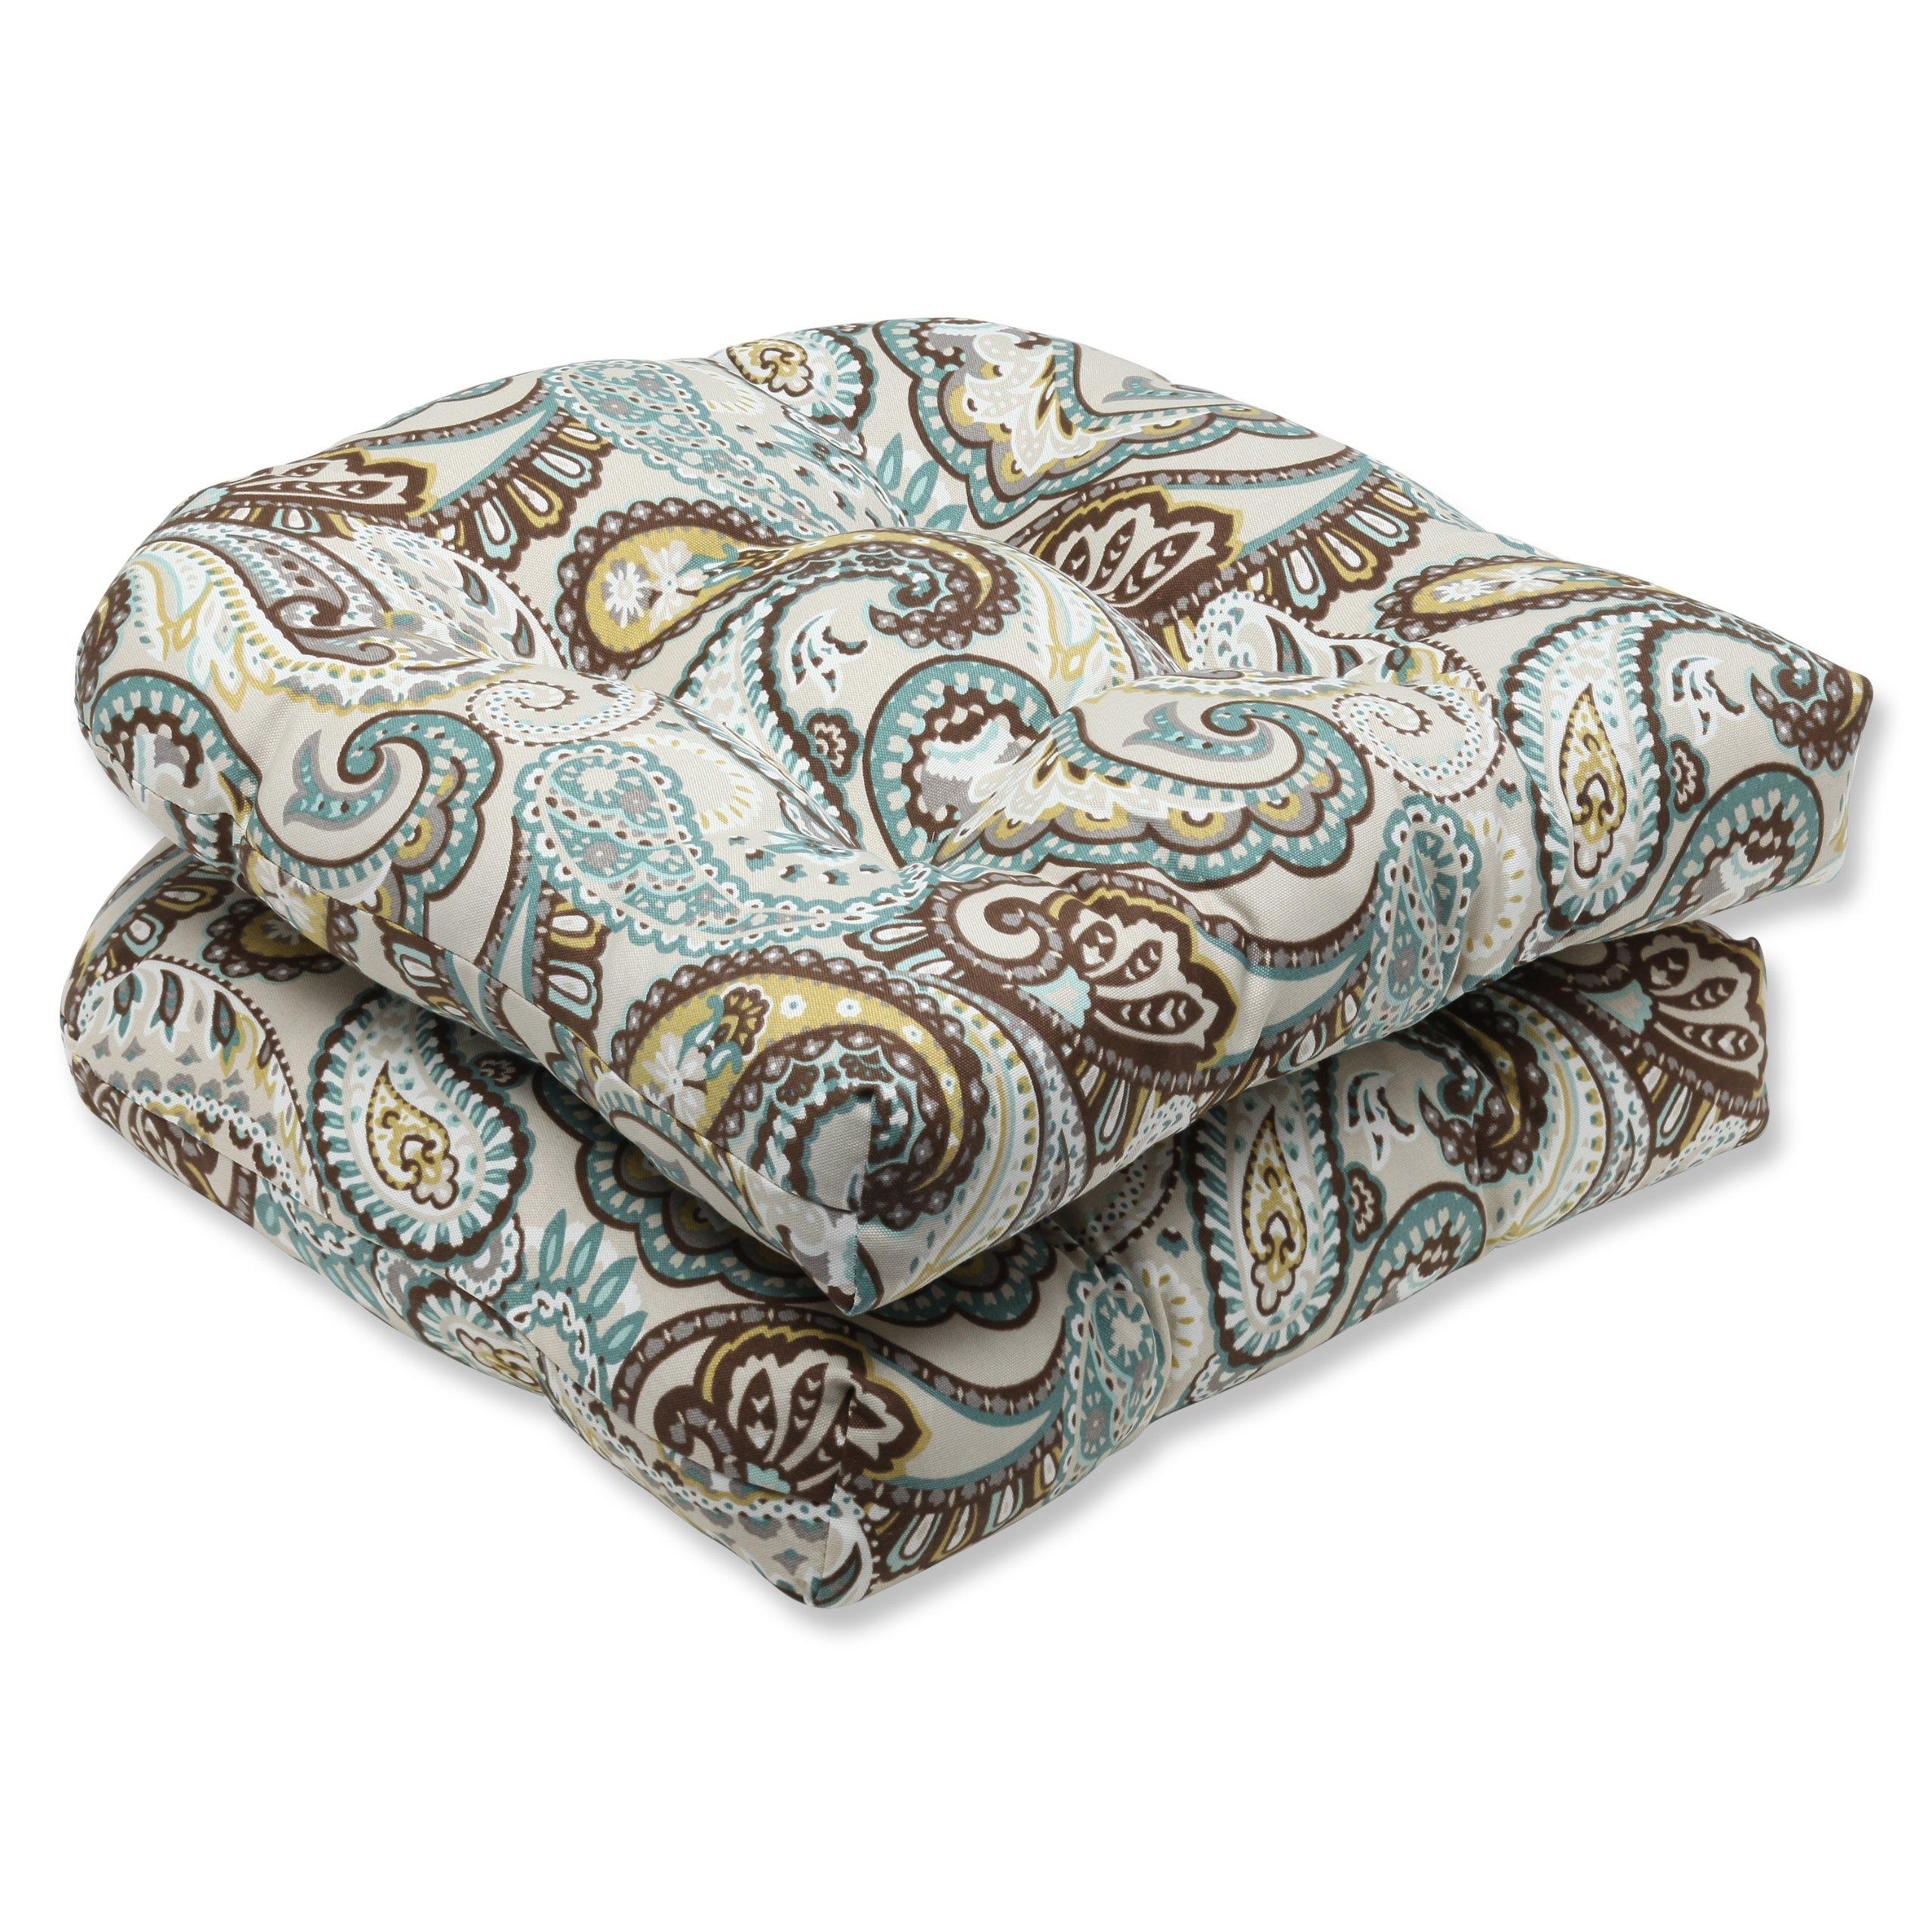 Pillow Perfect Outdoor Tamara Paisley Quartz Wicker